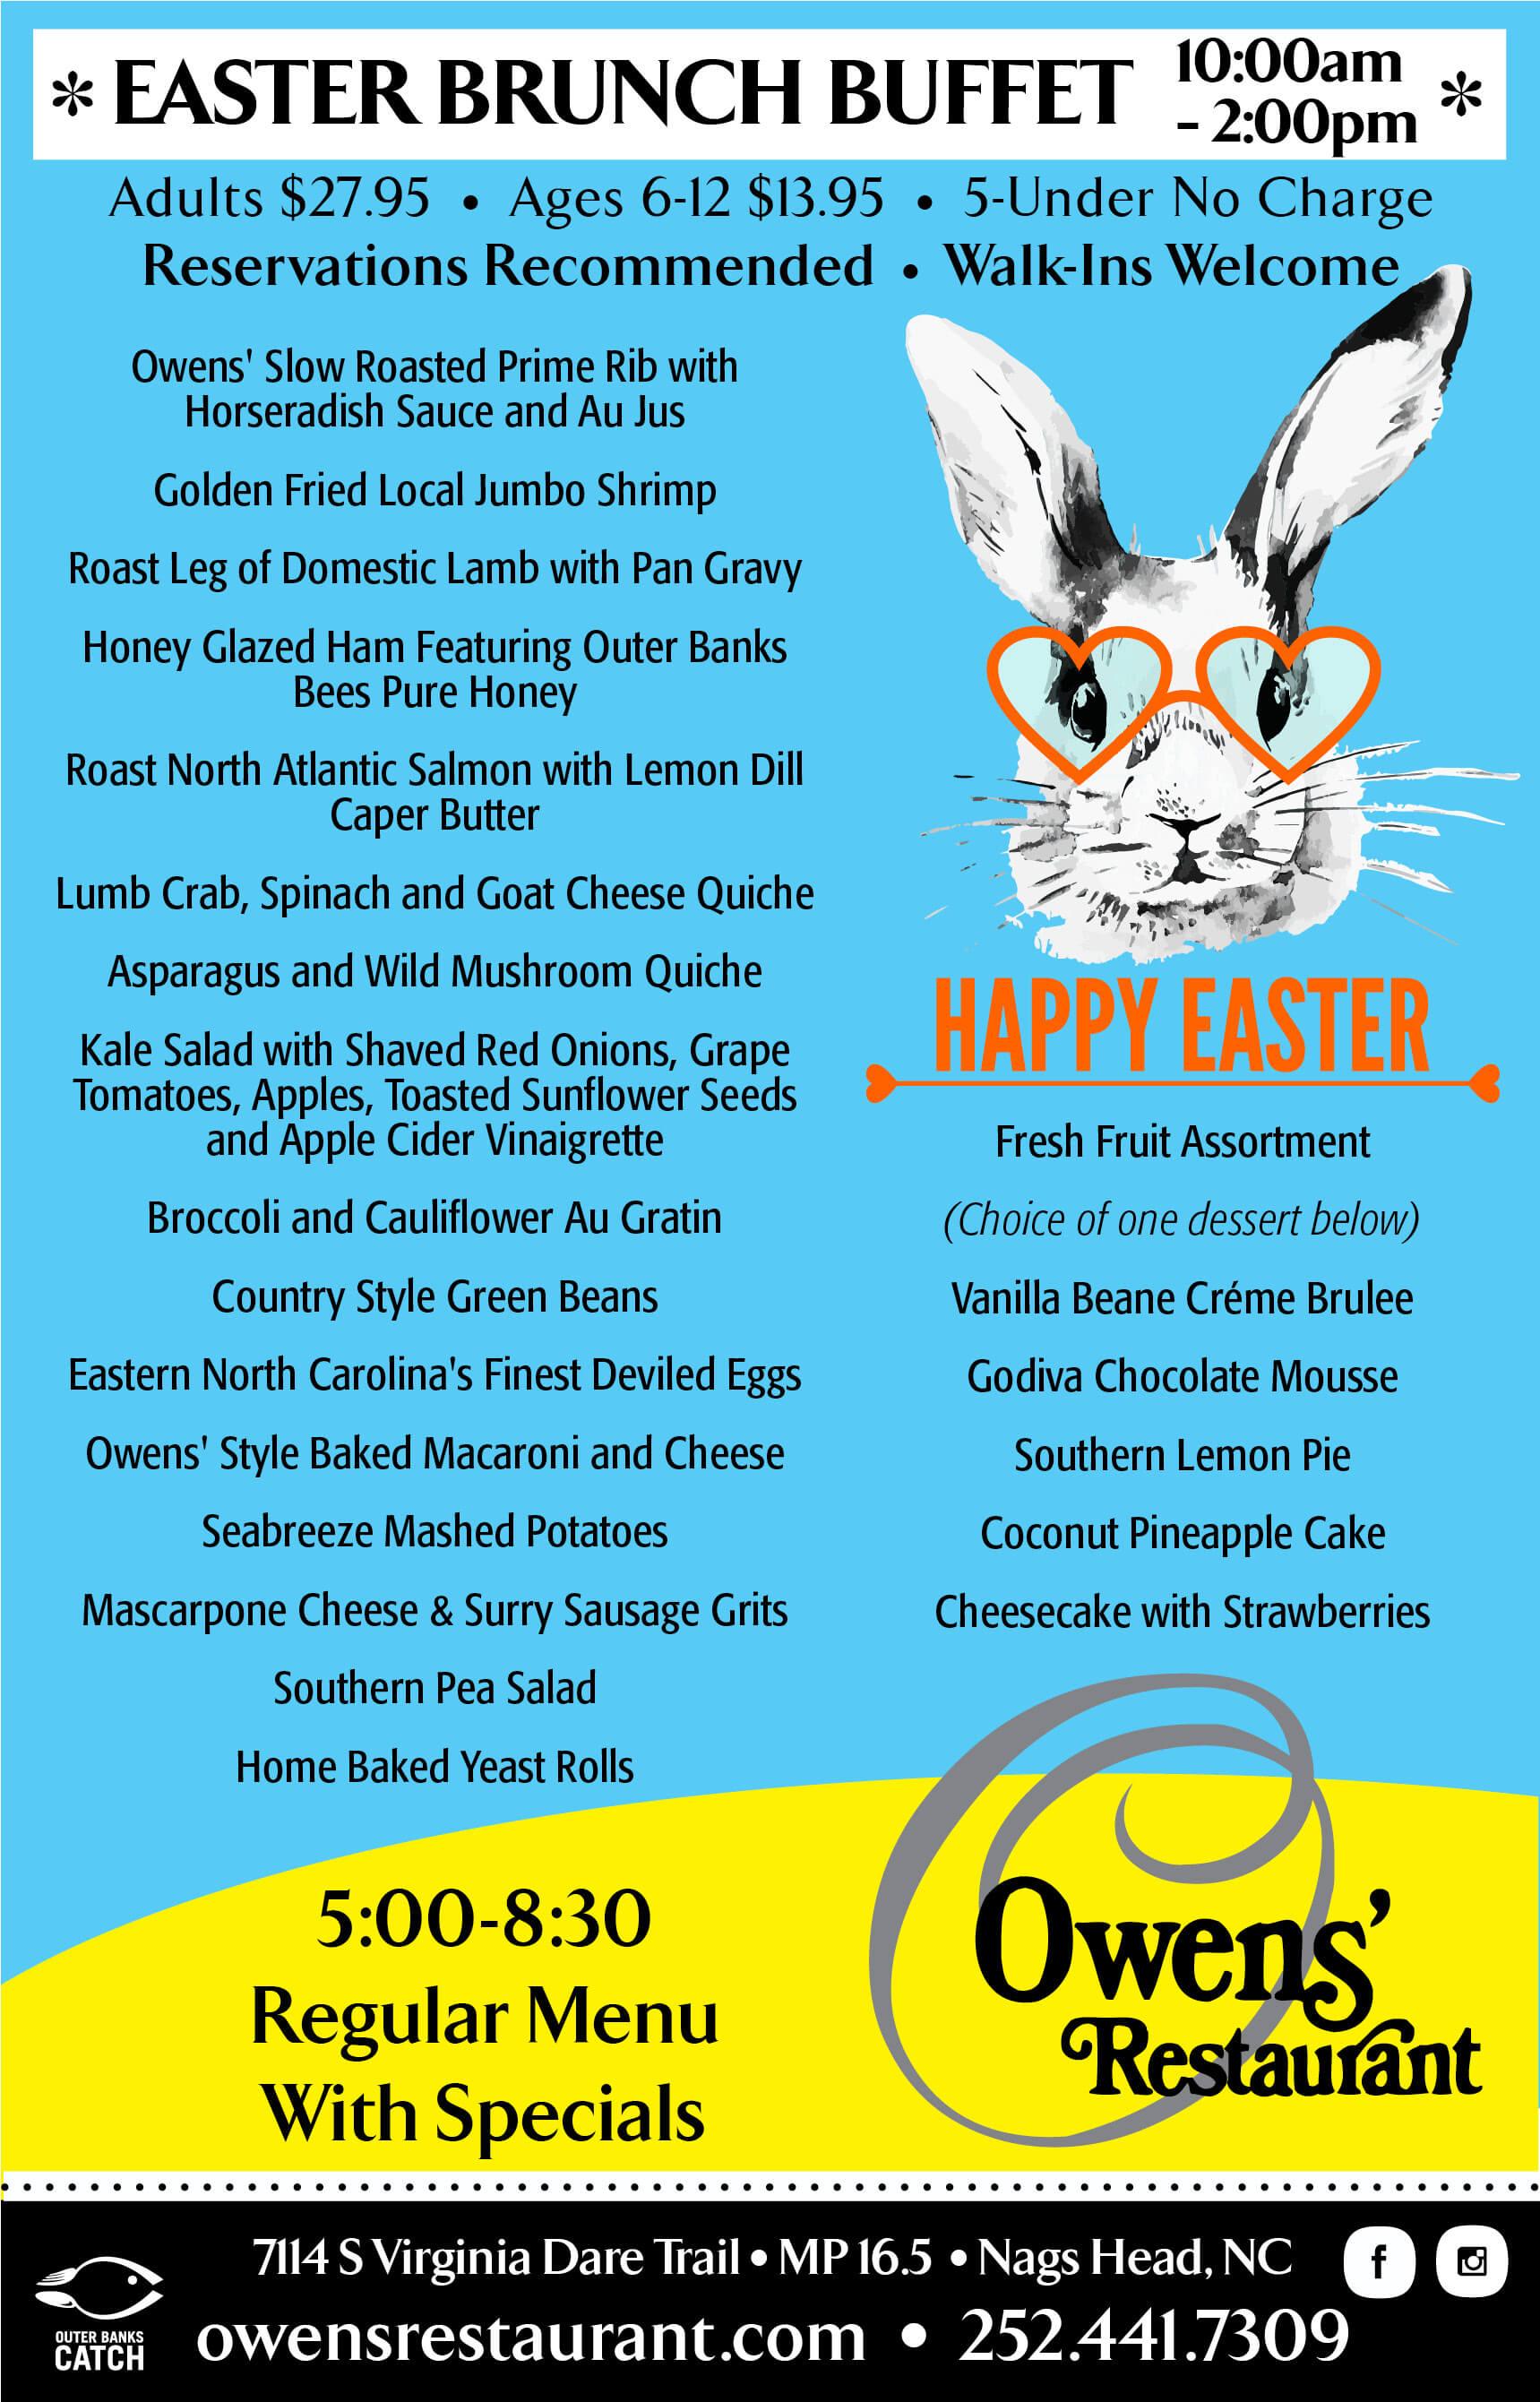 Owens' Restaurant Menu - Nags Head Restaurant Serving Fine